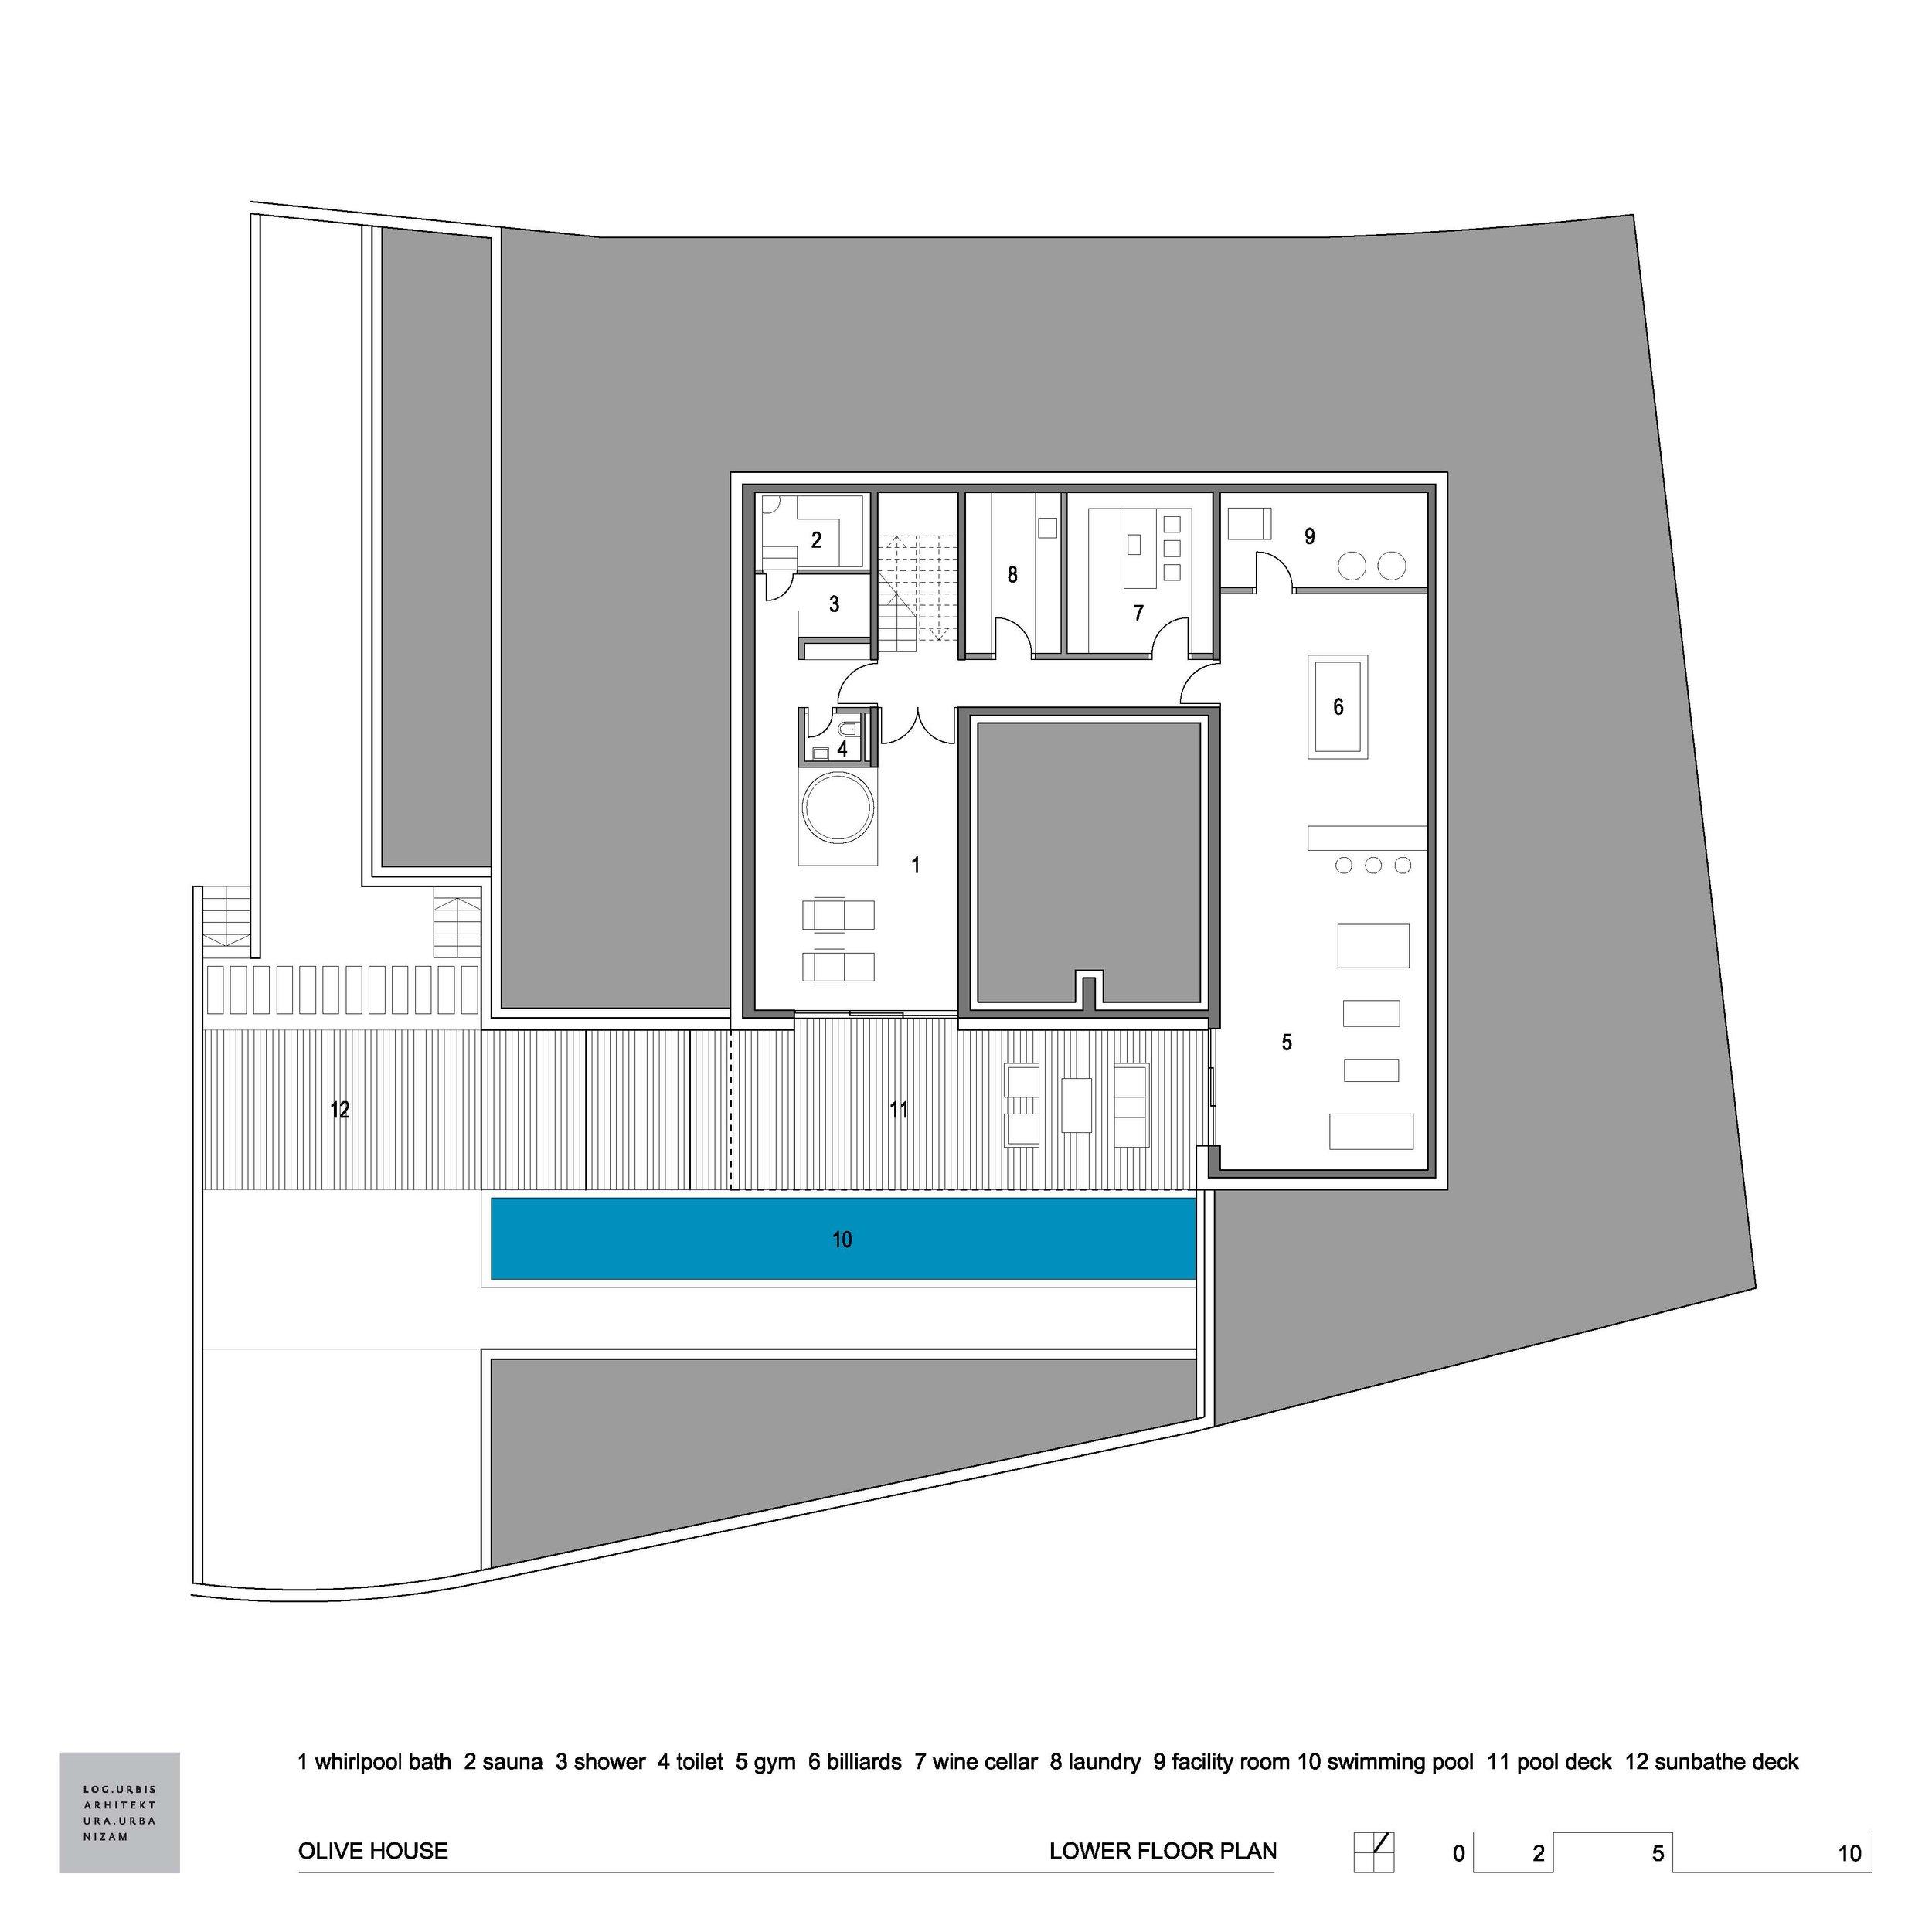 OLIVE HOUSE_WEB_PAGE 2_lower floor plan.jpg